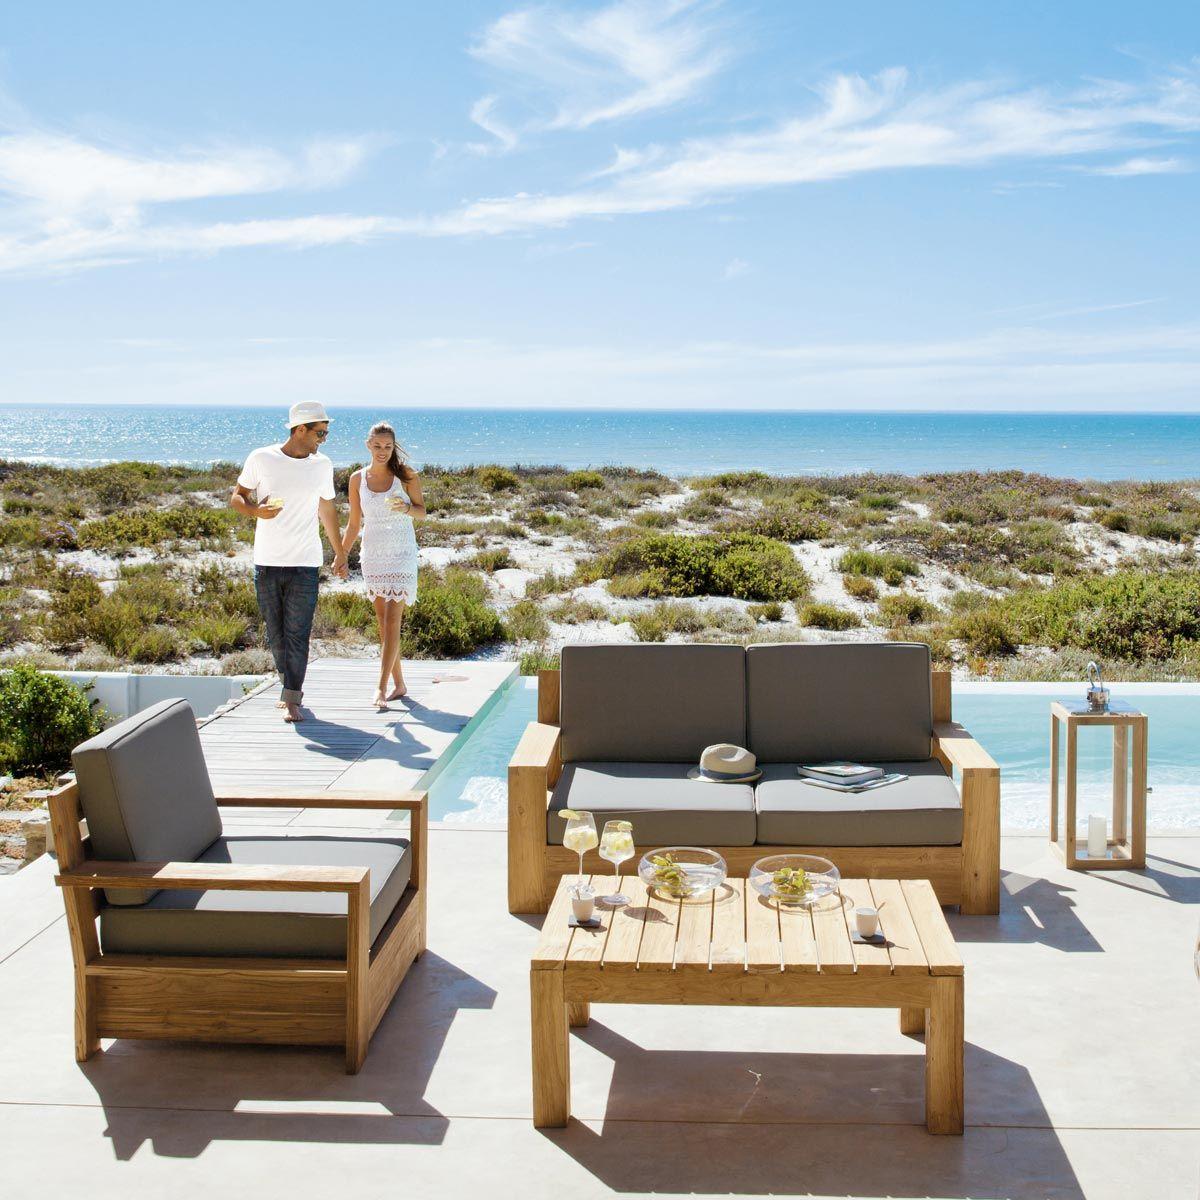 fauteuil de jardin en teck meubles jardin pinterest jardins banquette jardin et fauteuil. Black Bedroom Furniture Sets. Home Design Ideas